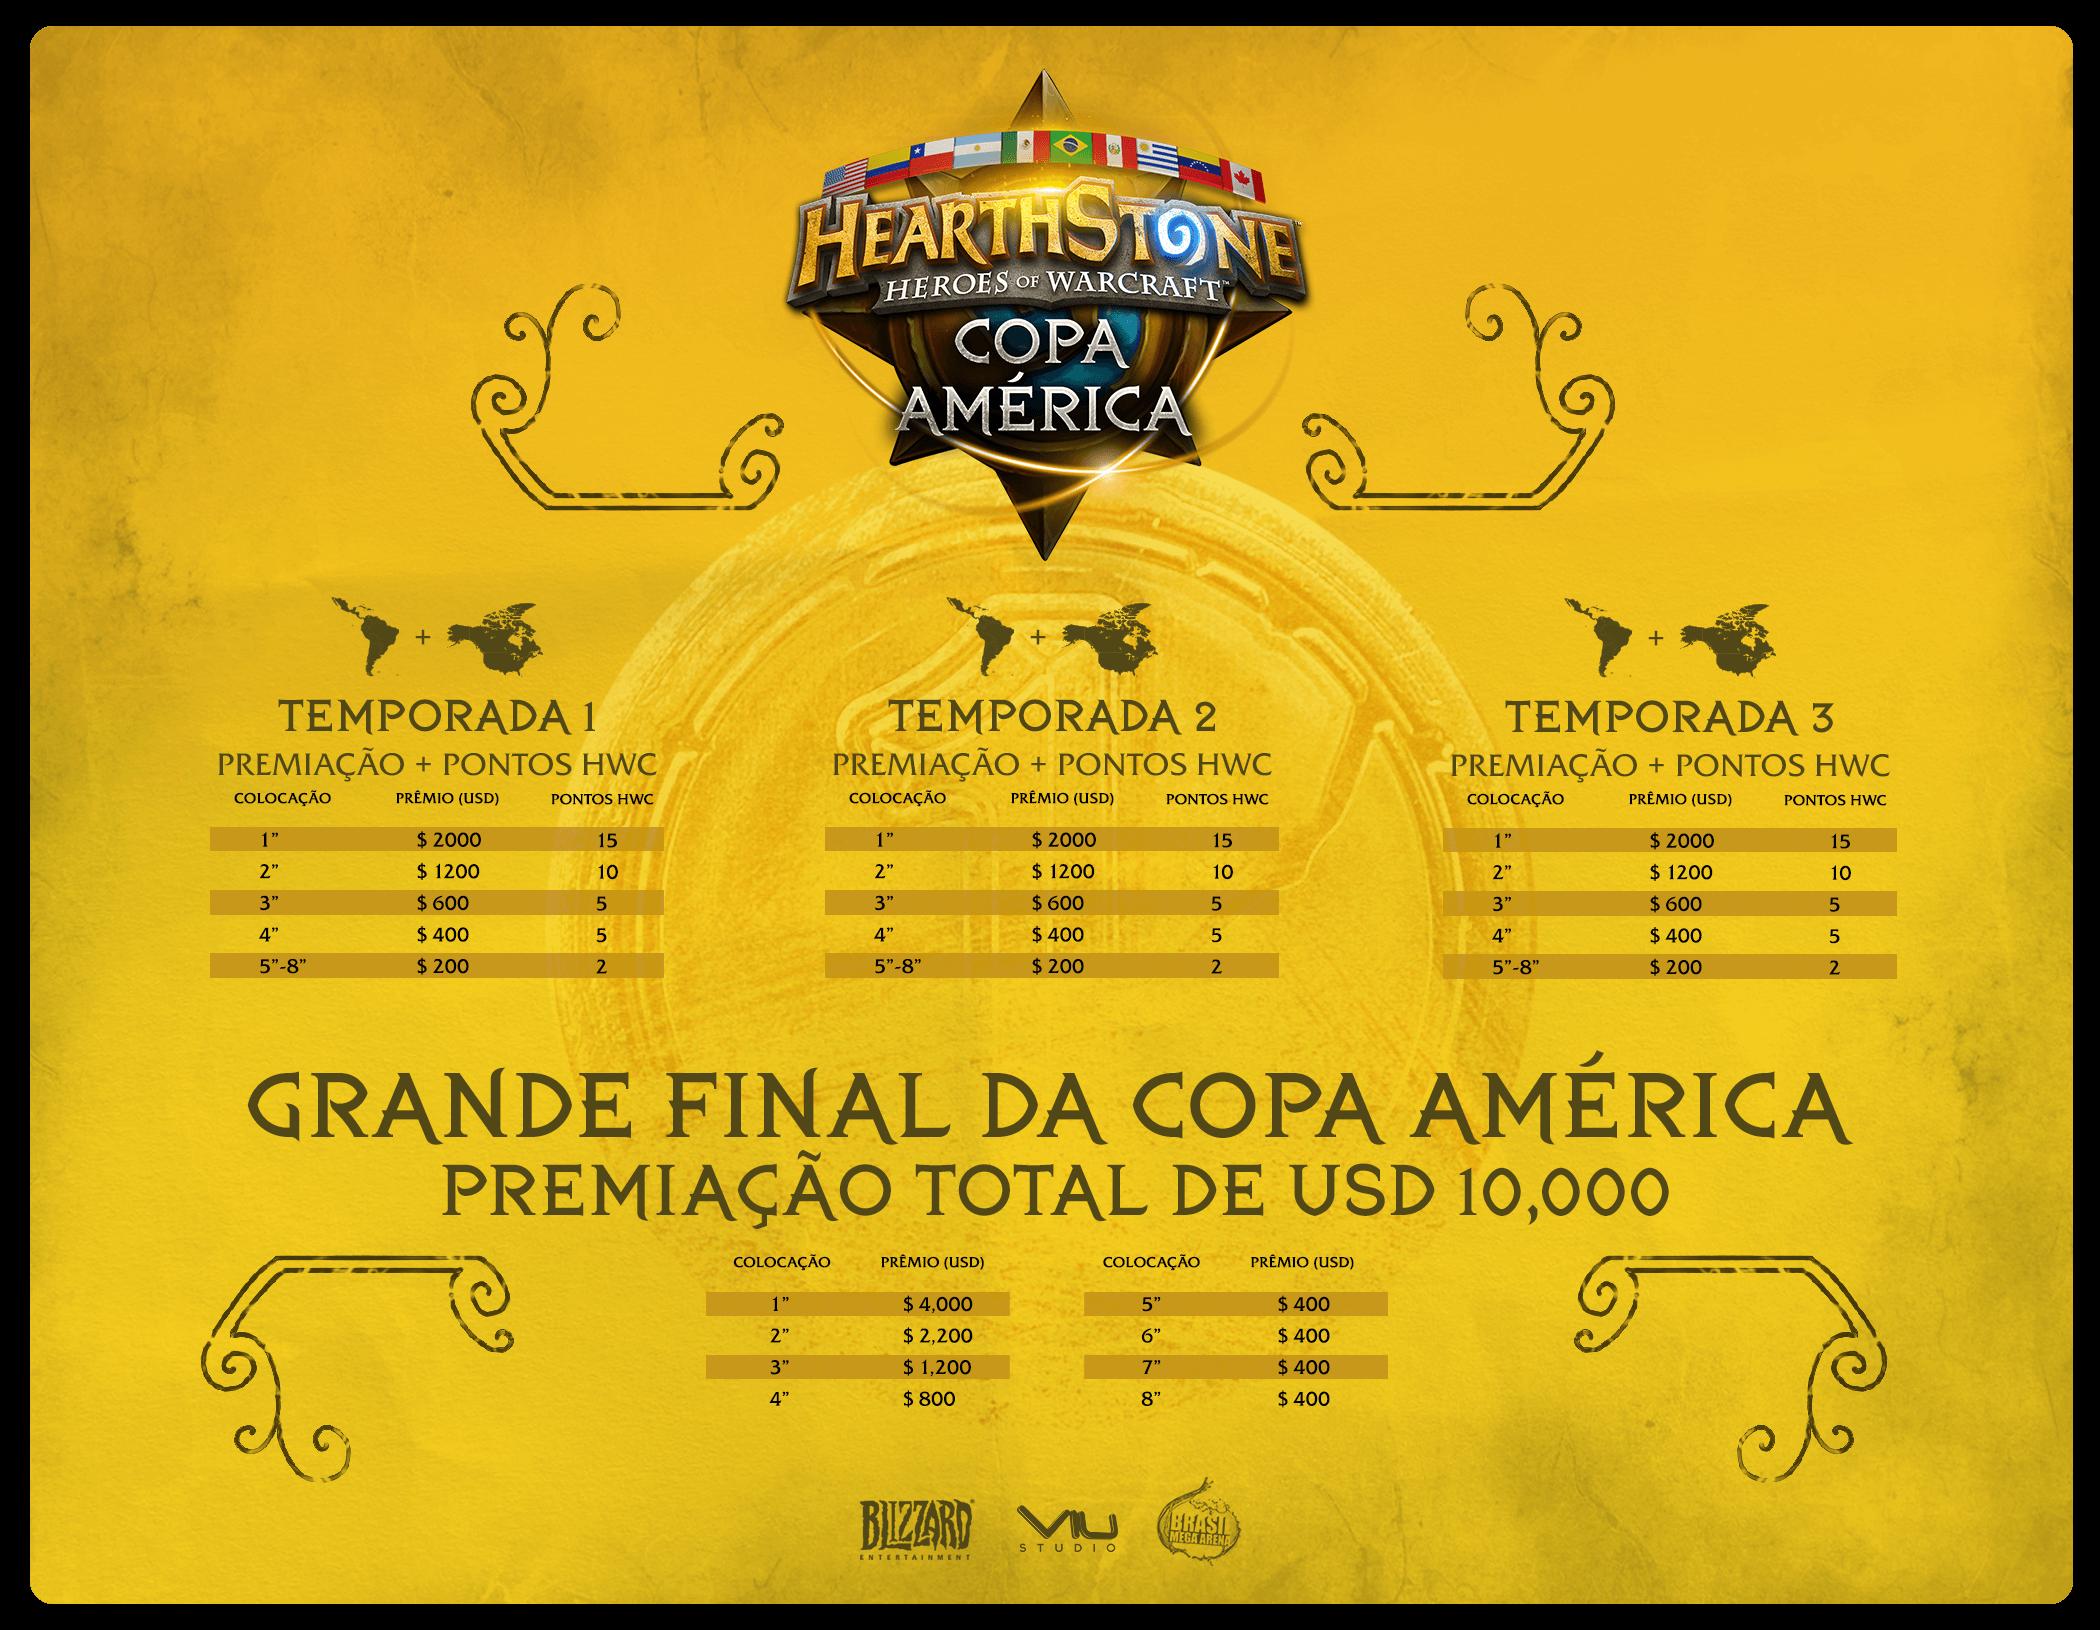 copa américa 2016.1